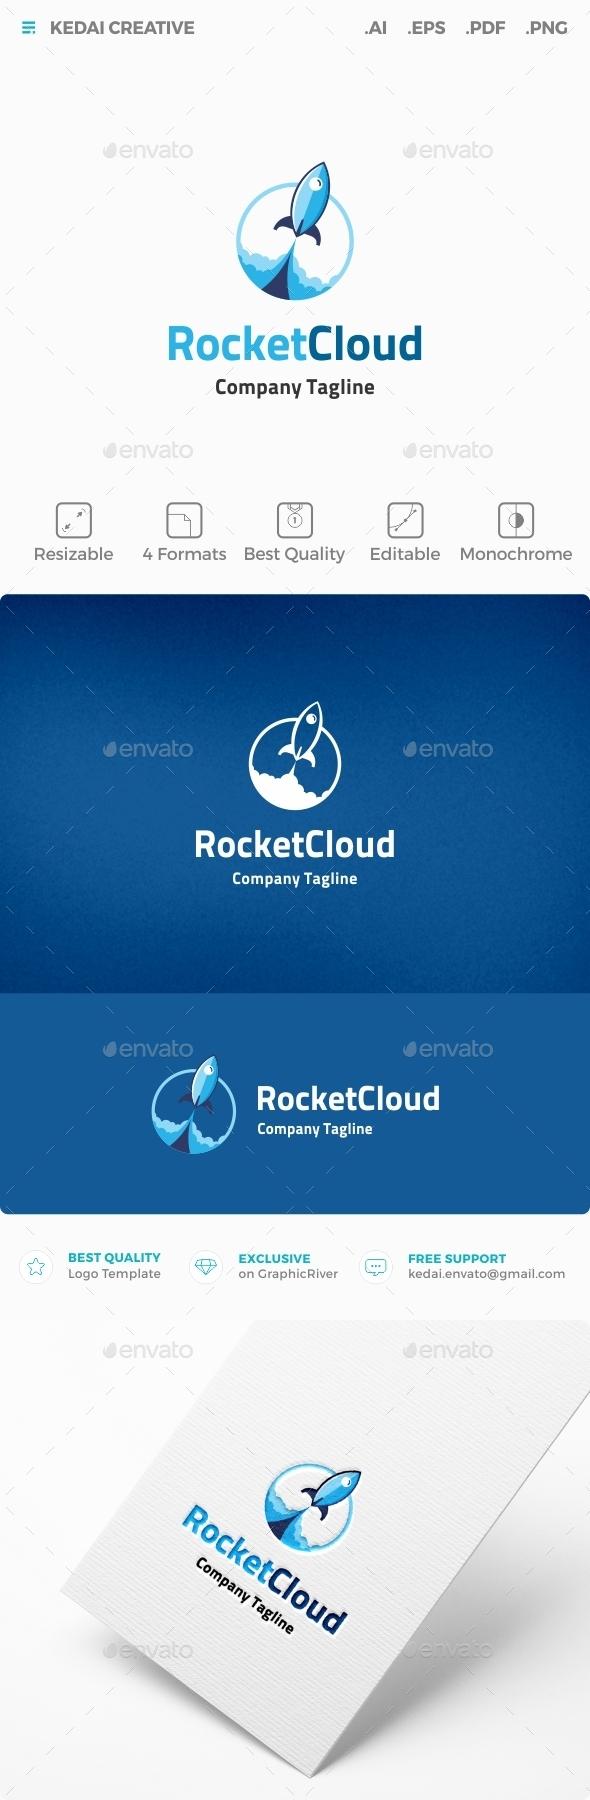 Rocket Cloud